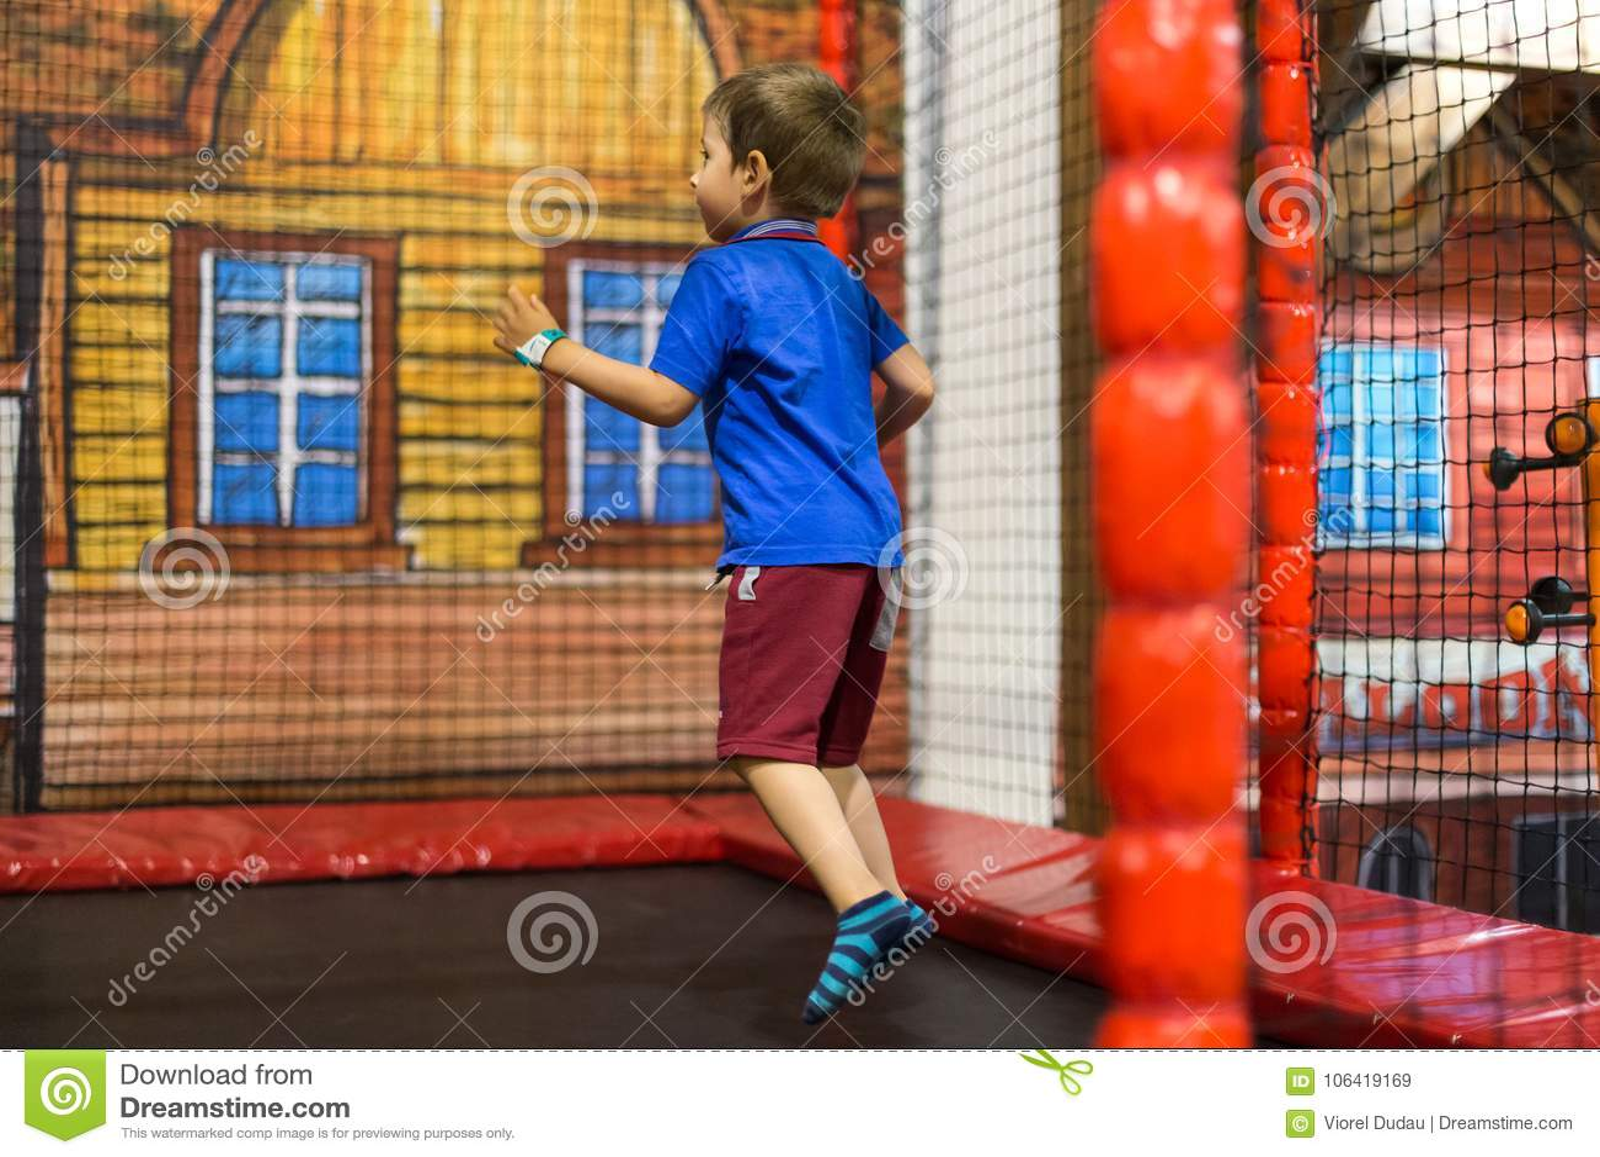 Child on trampoline at playground